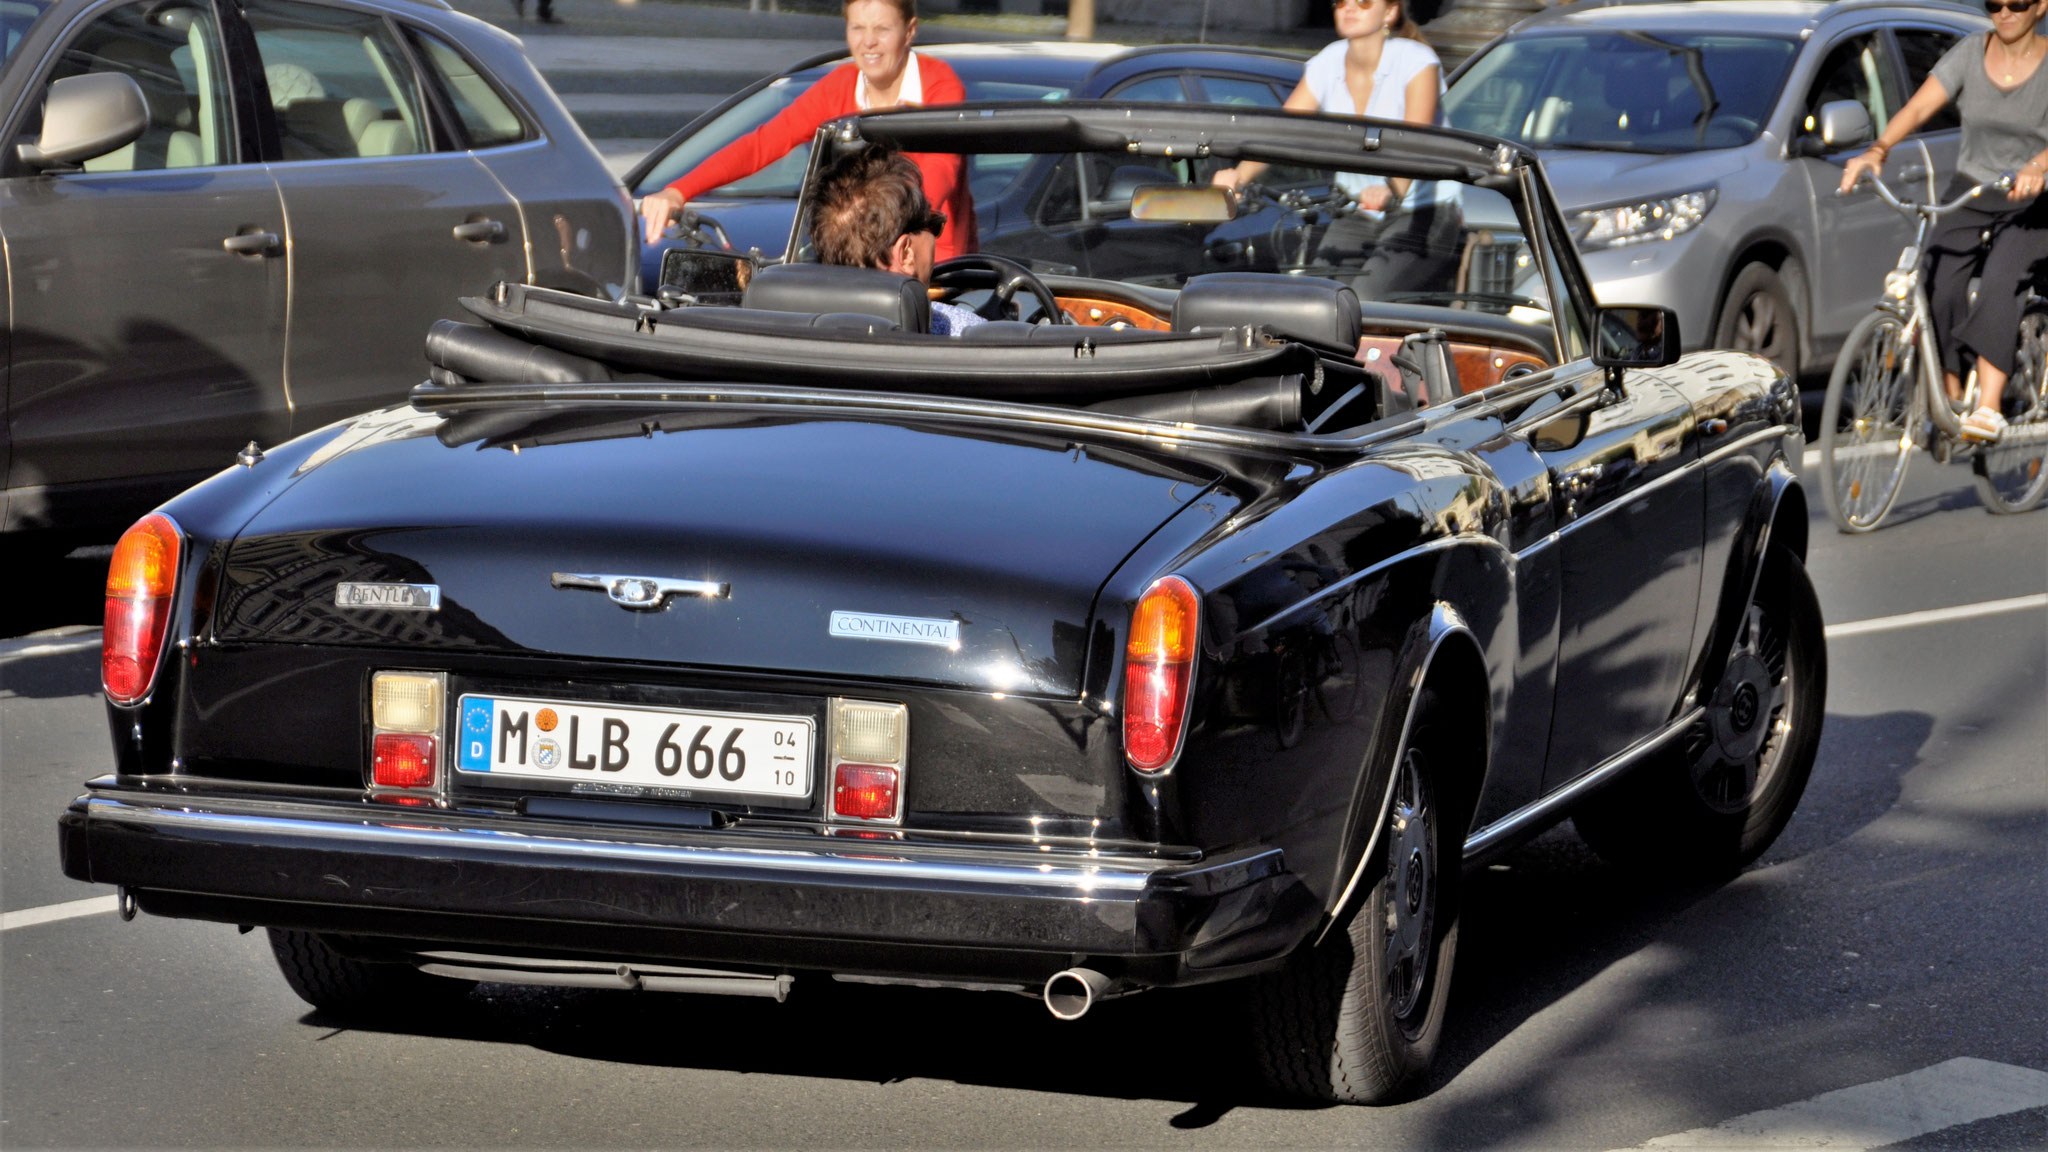 Bentley Corniche - M-LB-666